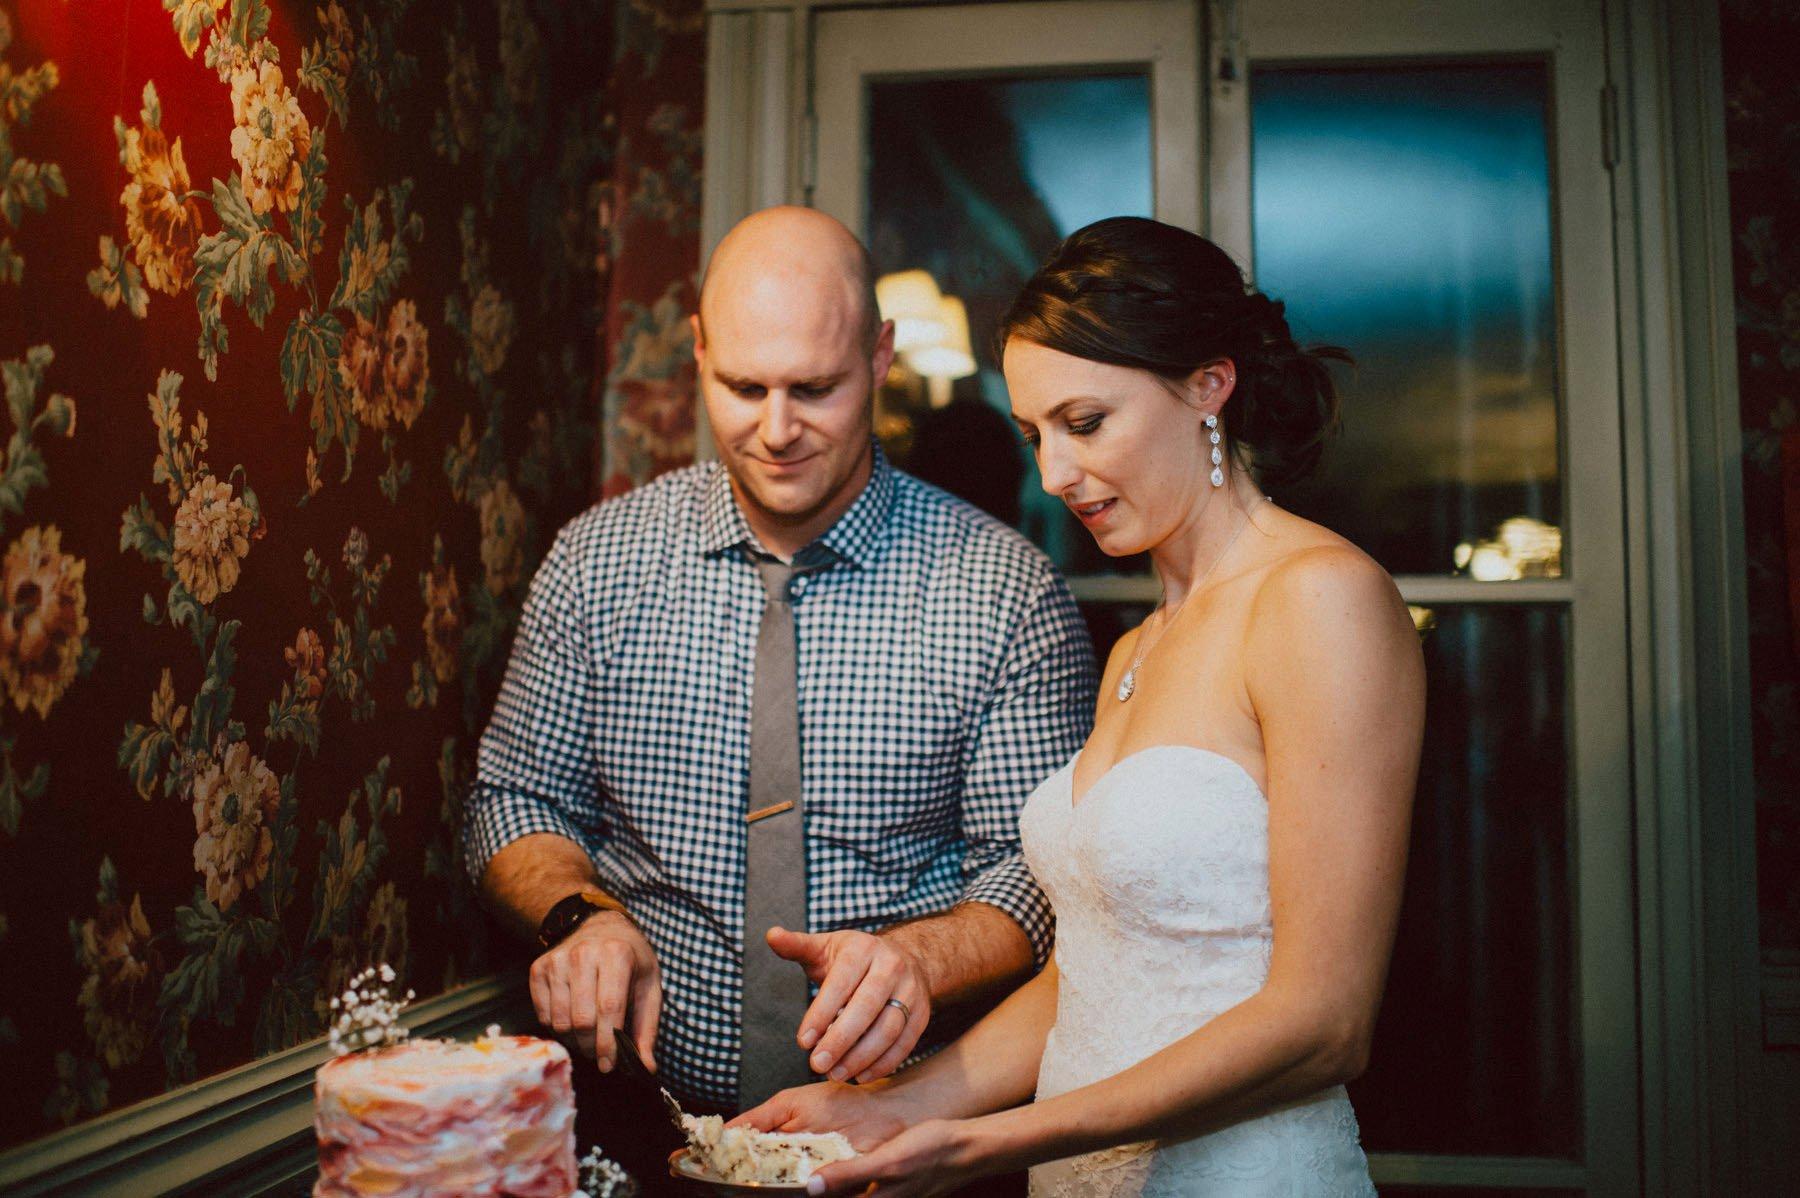 faunbrook-bed-and-breakfast-wedding-179.jpg